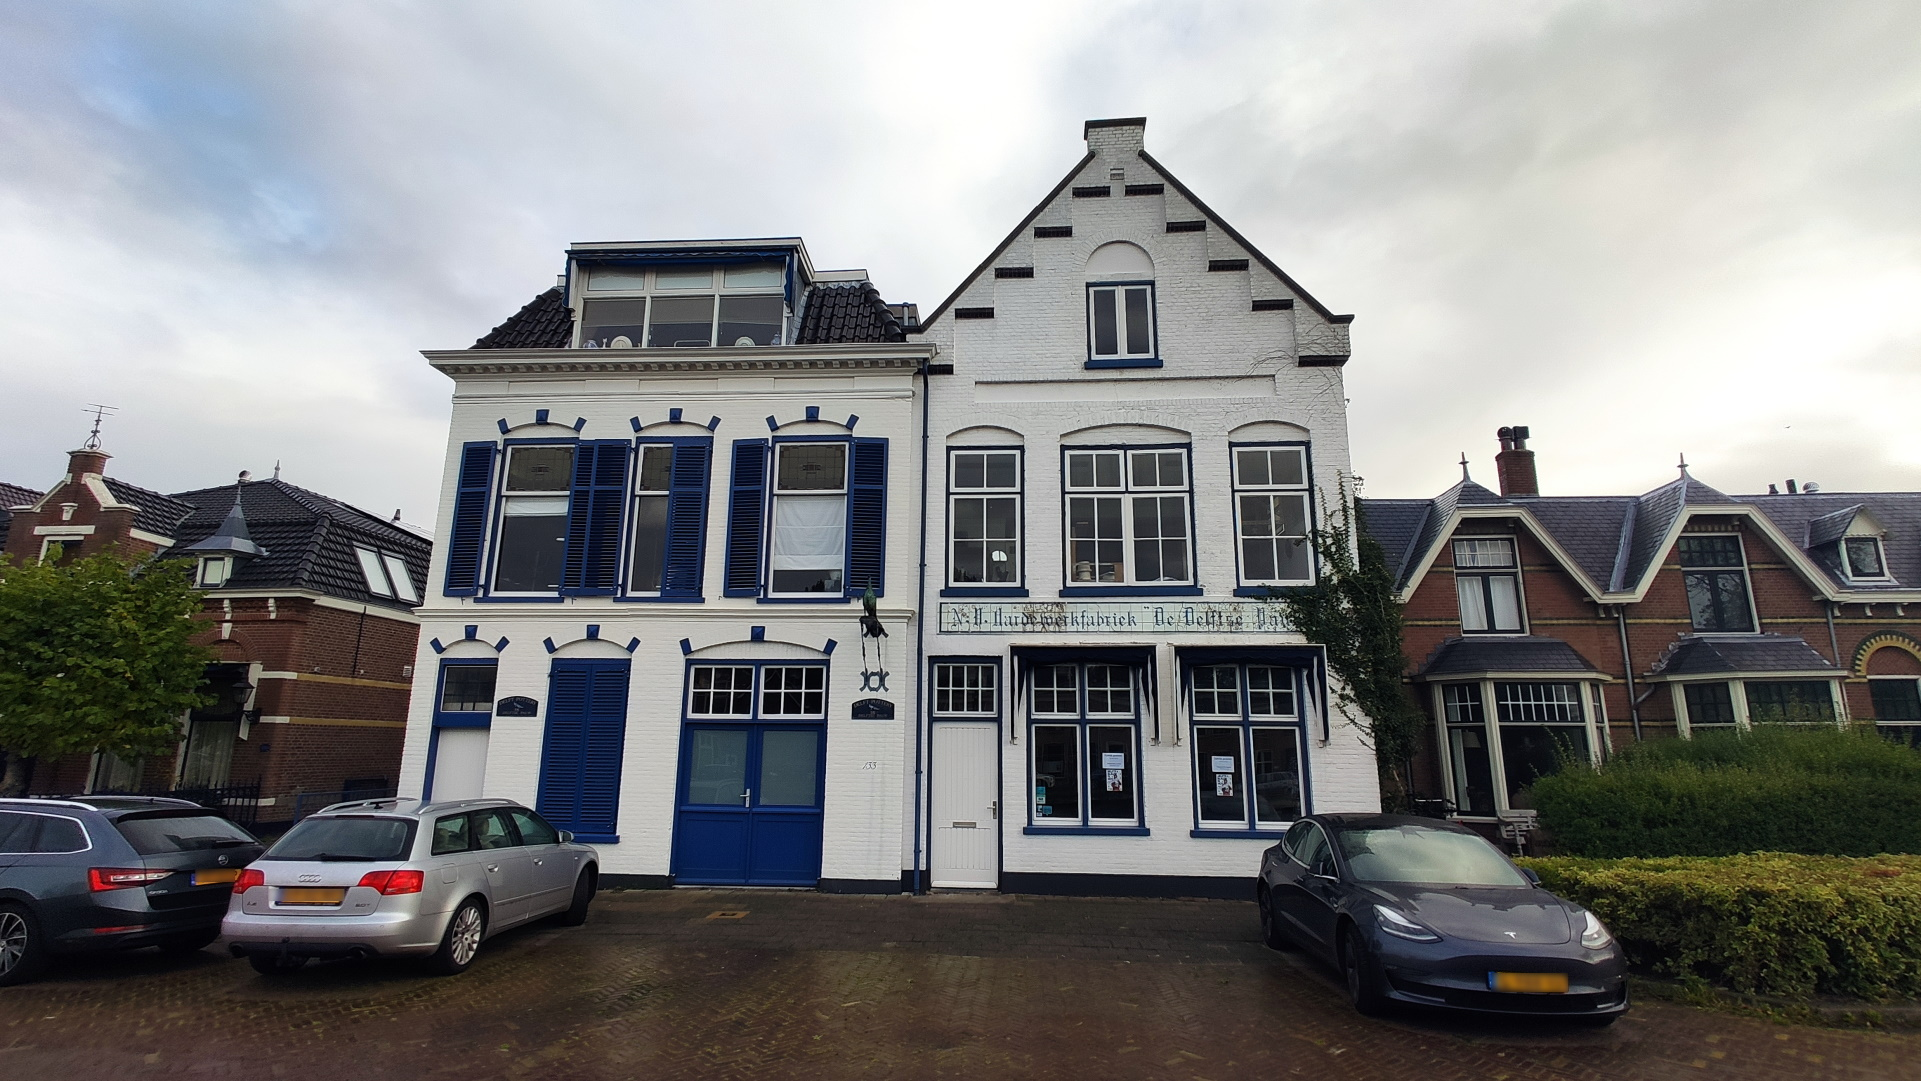 Aardewerkfabriek Delftse Pauw